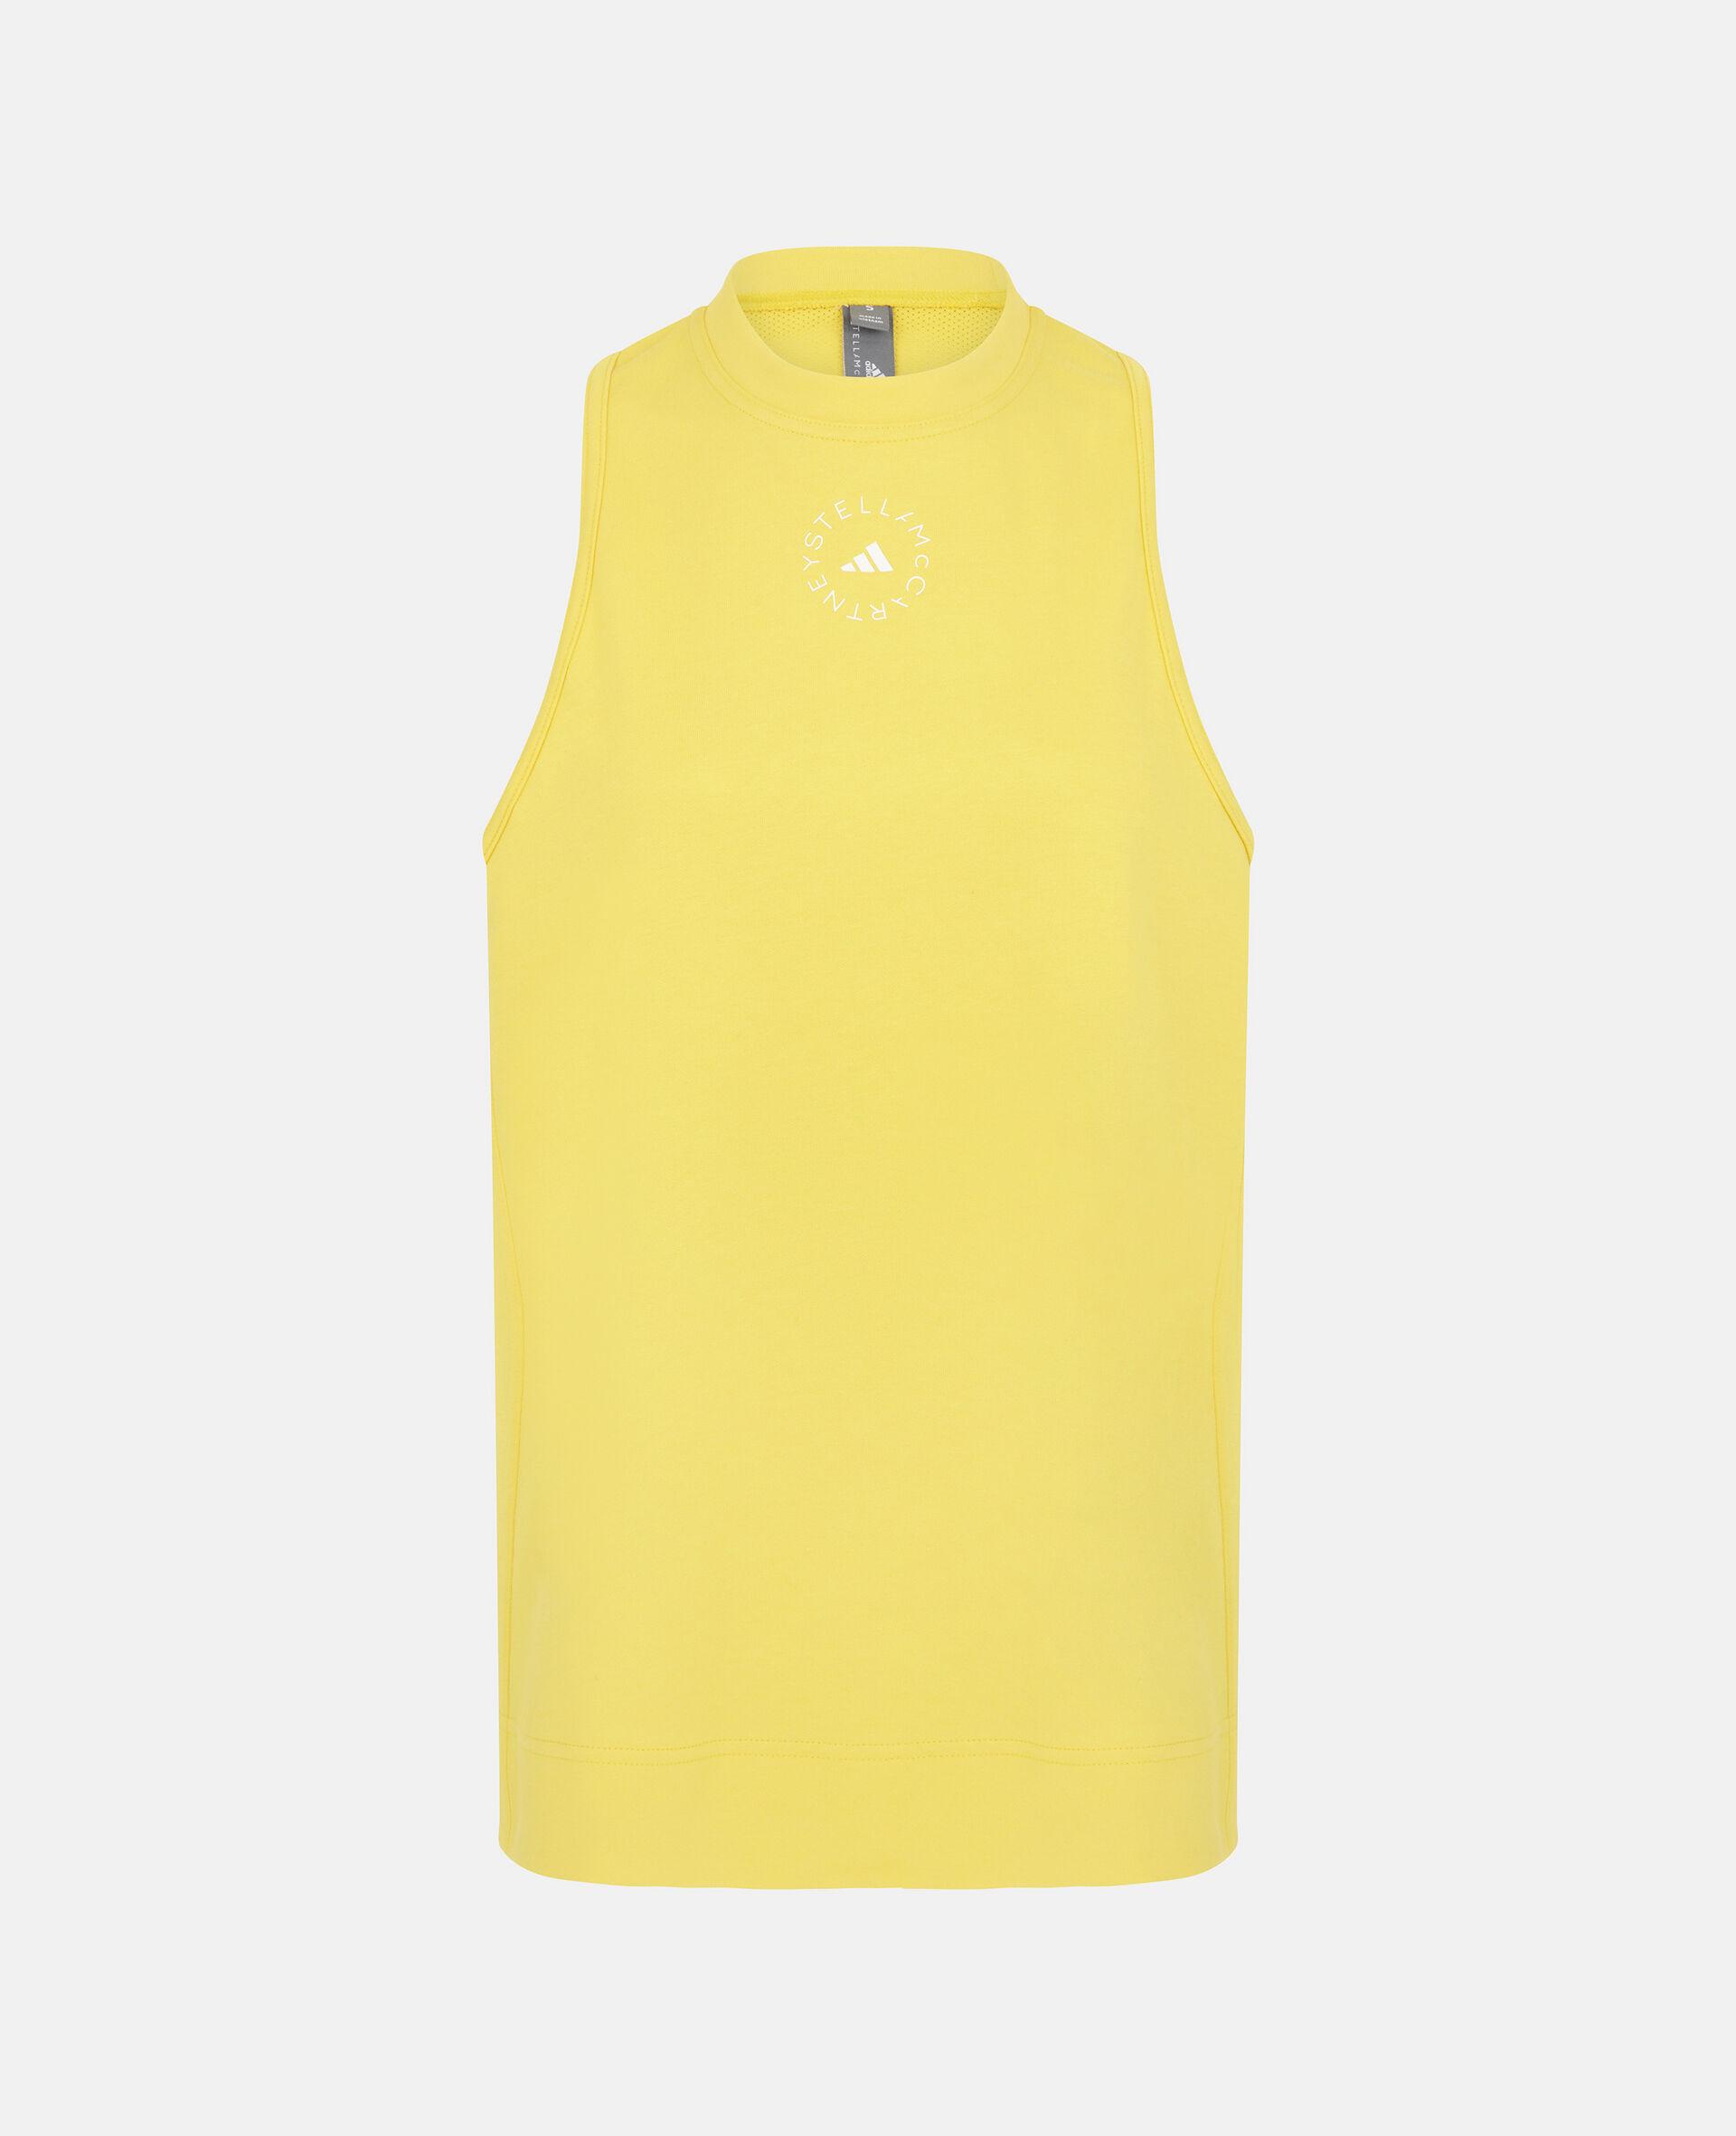 Yellow Training Tank Top-Yellow-large image number 0